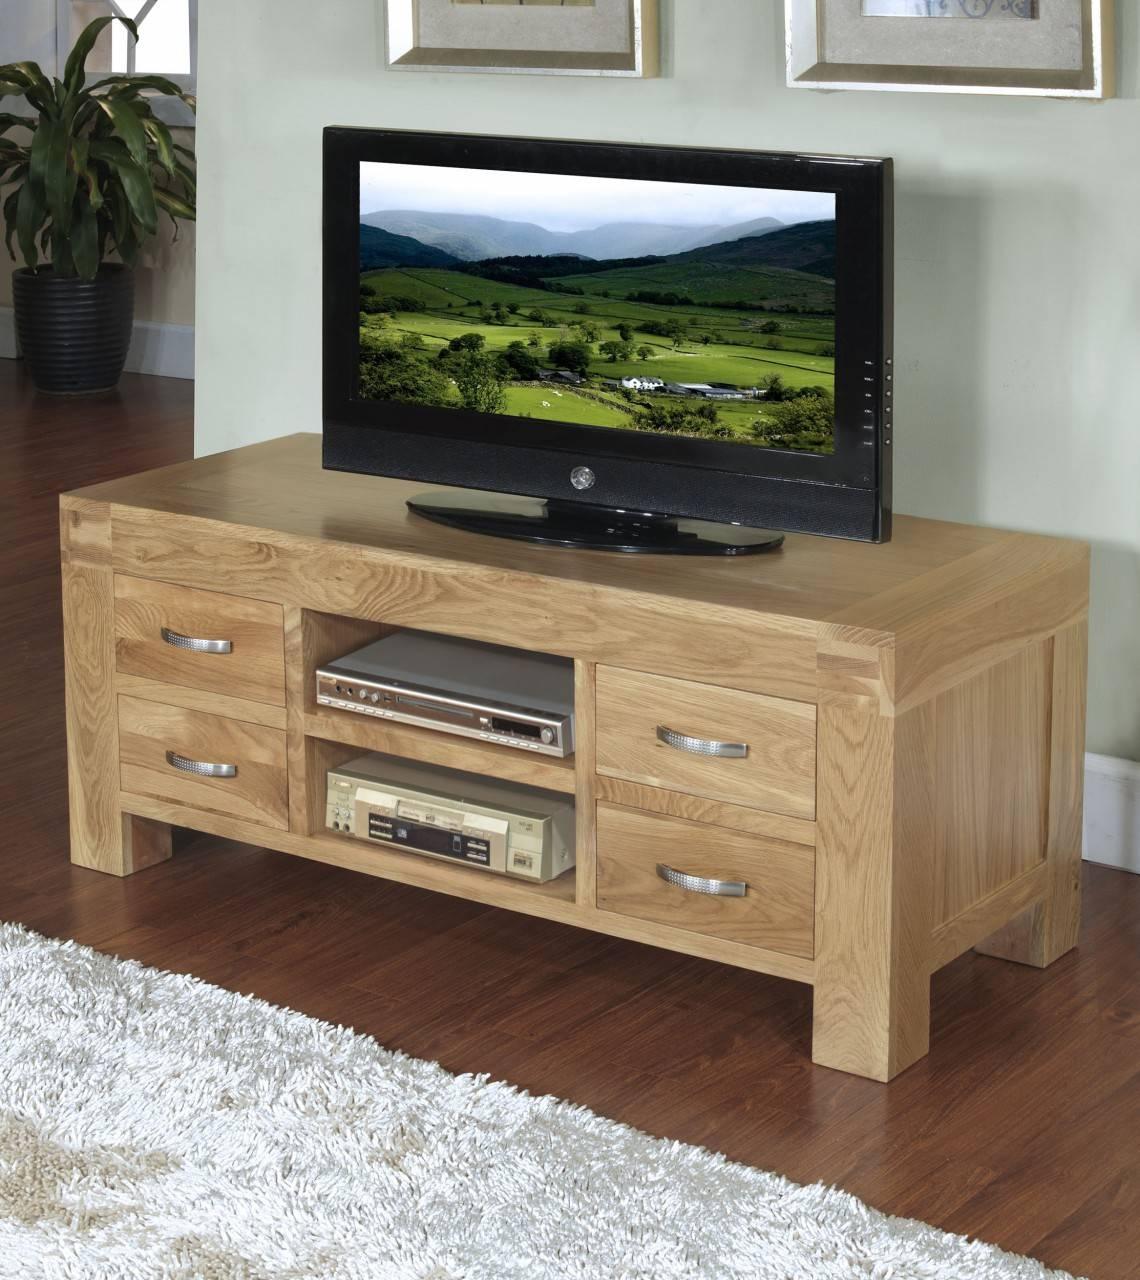 rivermead solid oak modern furniture widescreen tv cabinet stand for rustic oak tv stands image